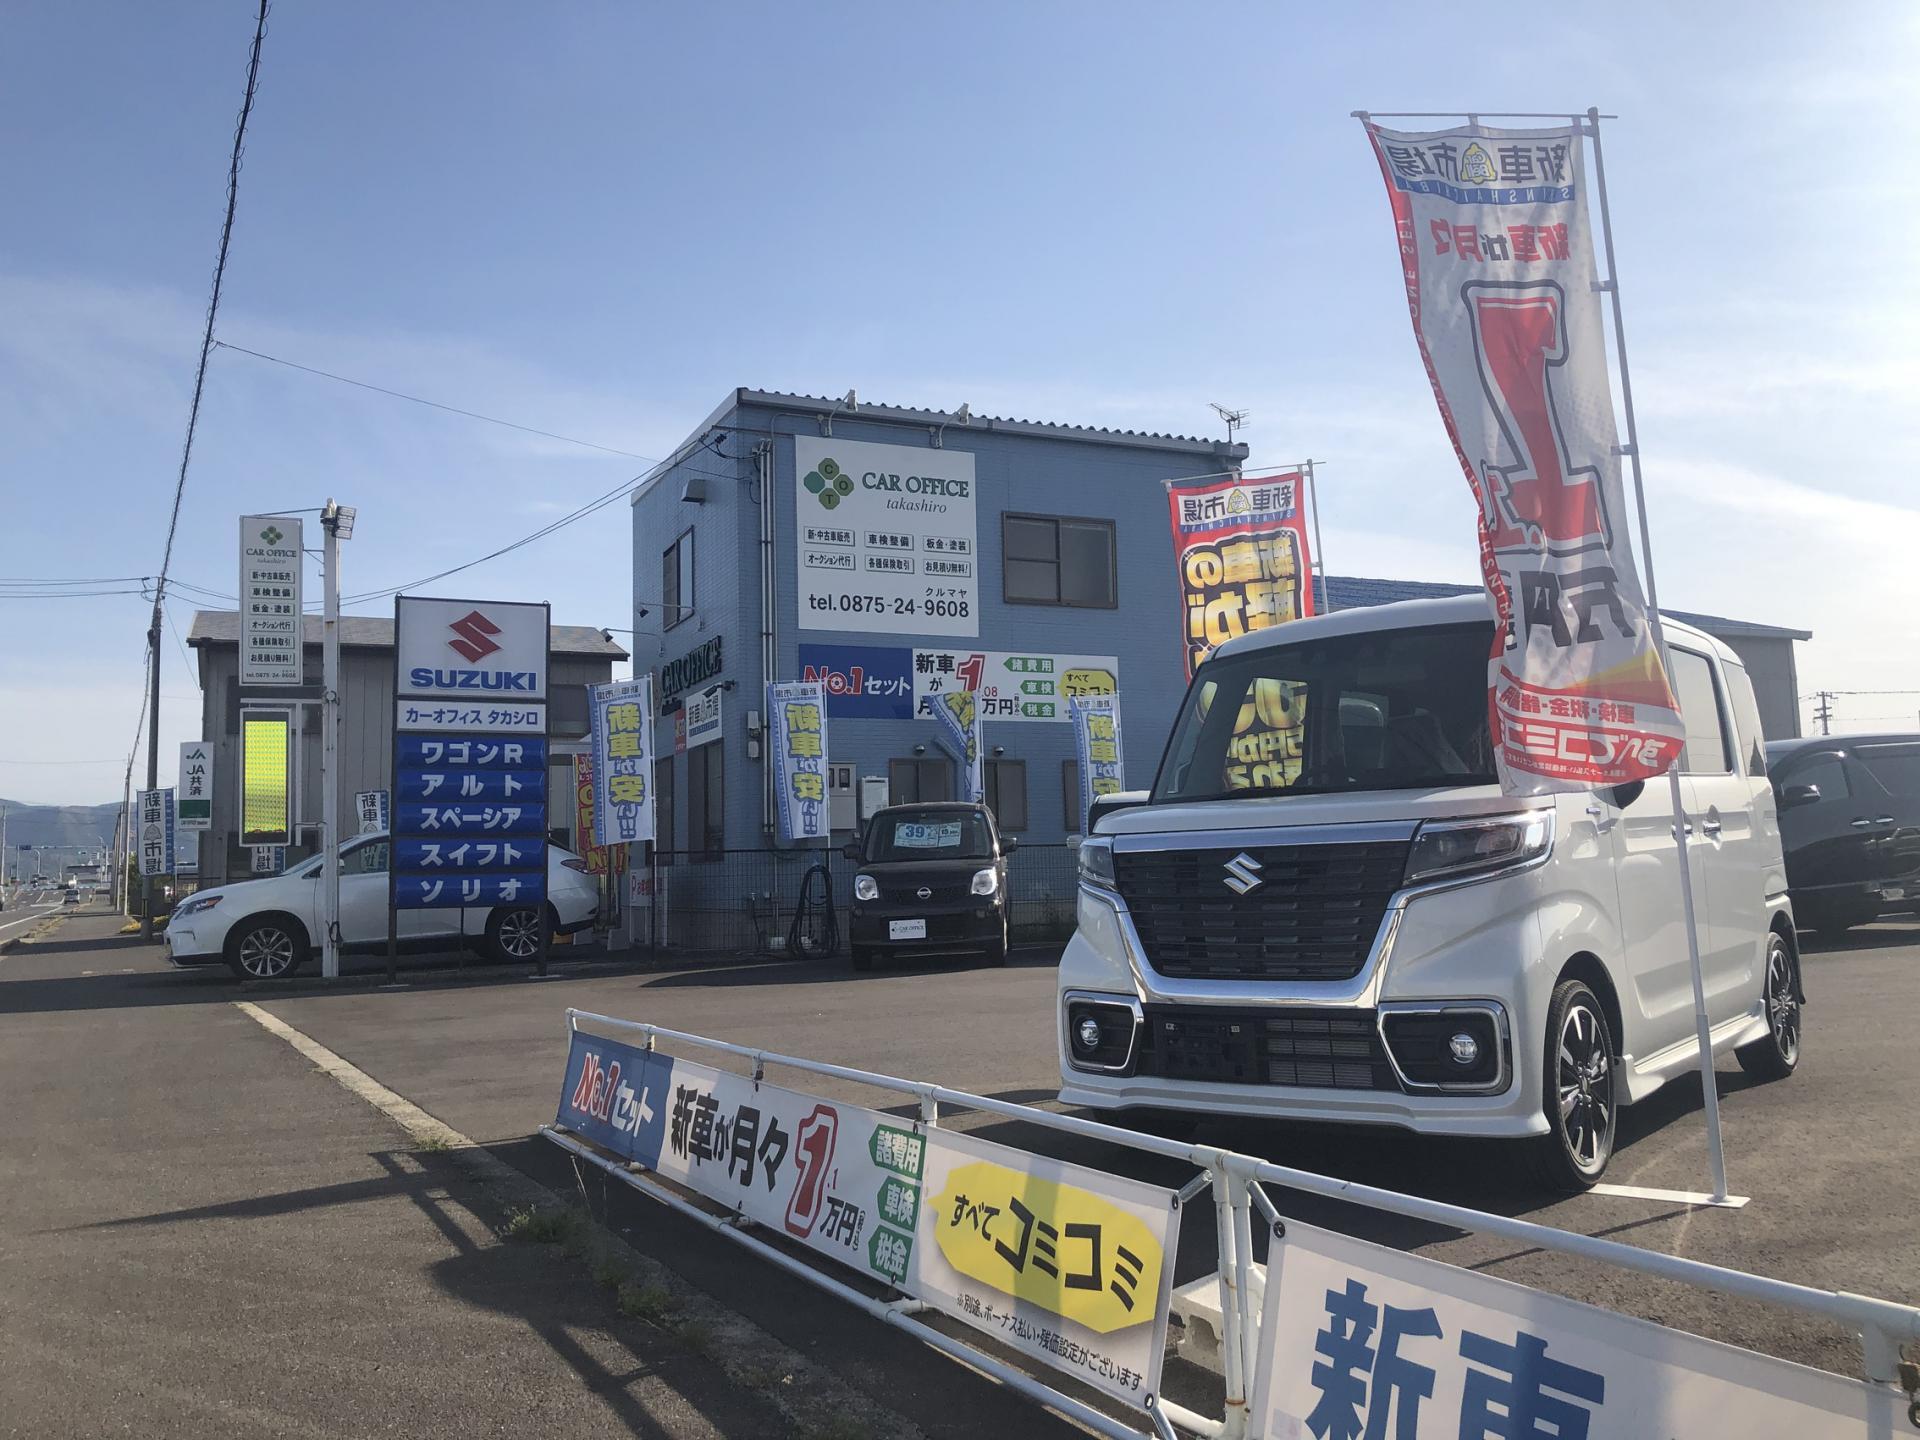 CAR OFFICE takashiro  新車市場 観音寺三本松店